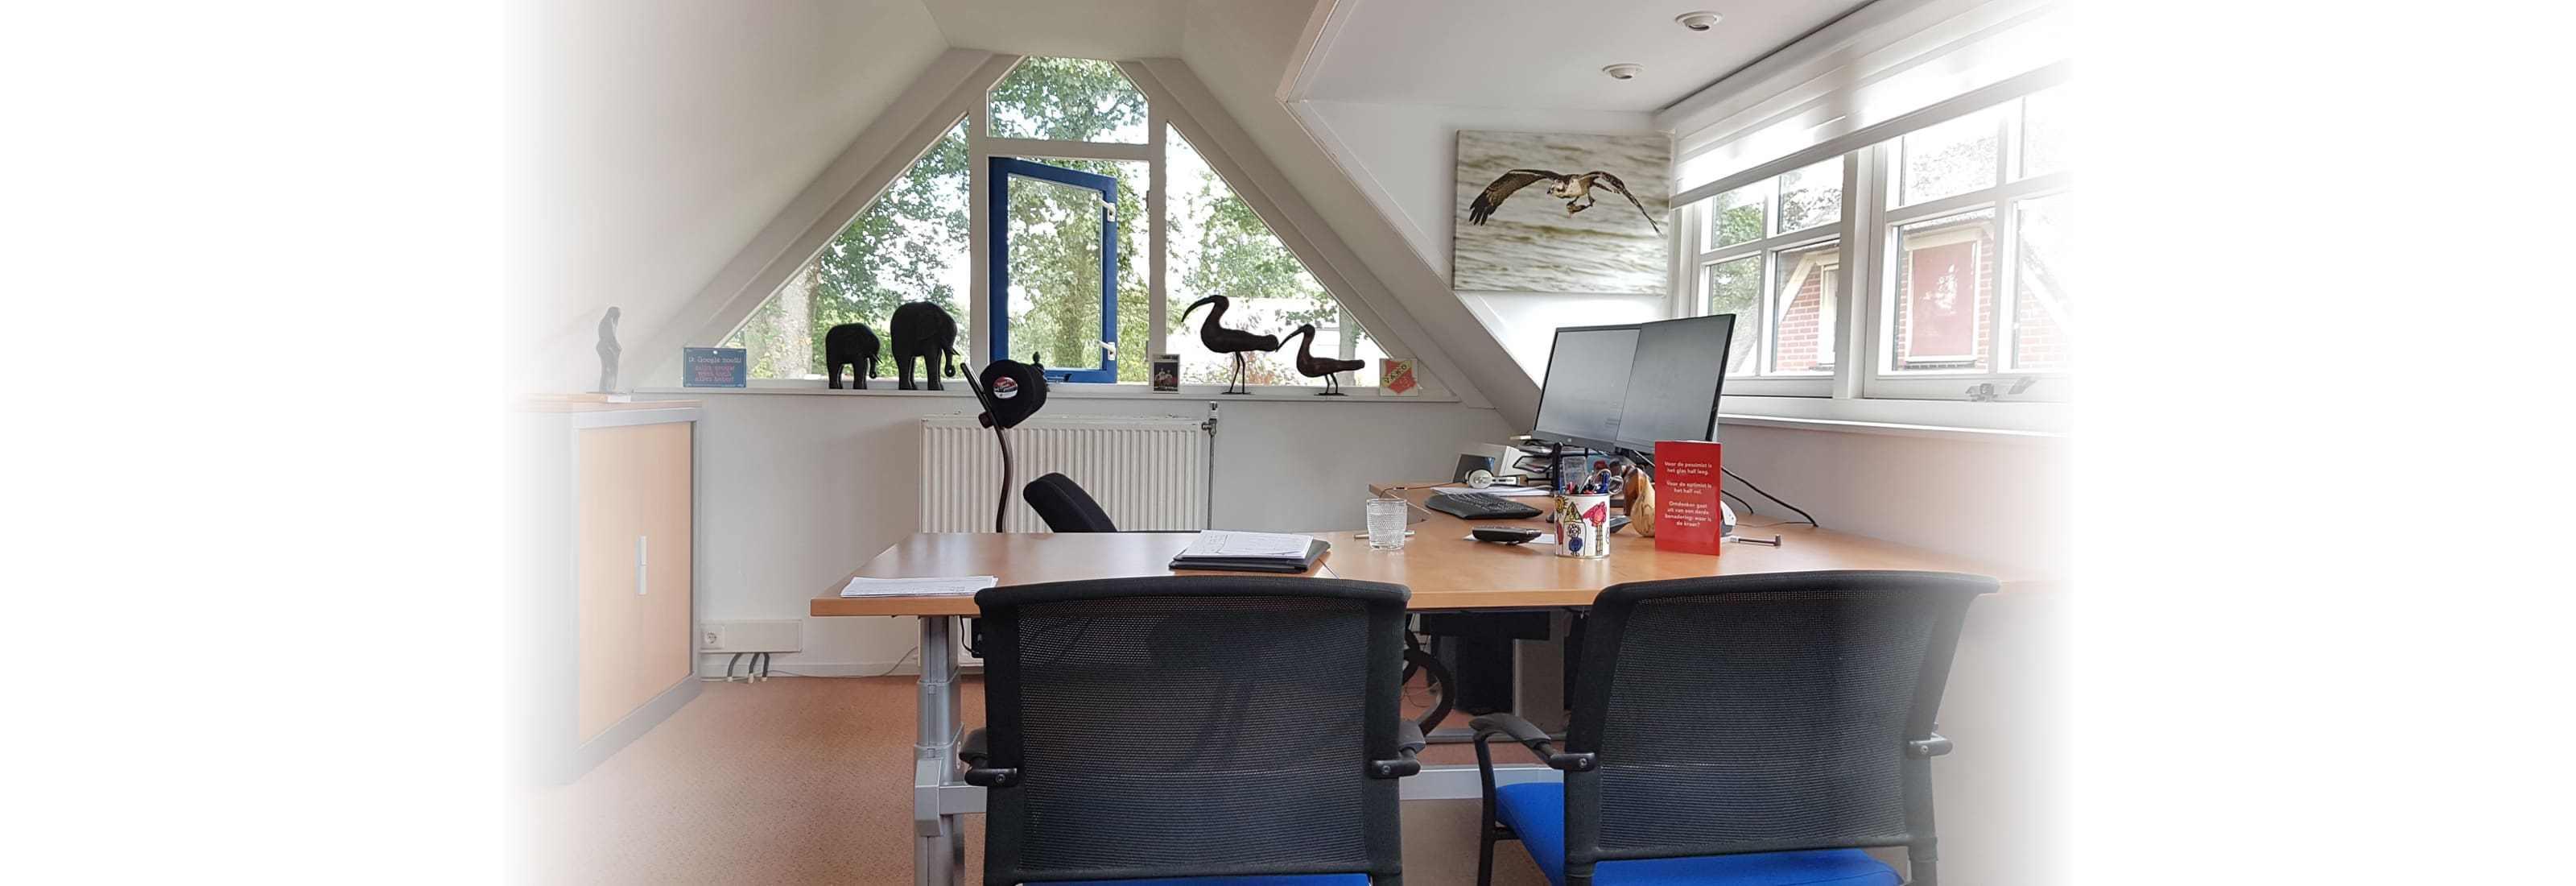 F-KWadraat Winstadviseurs - Winstadviesbureau in Vries